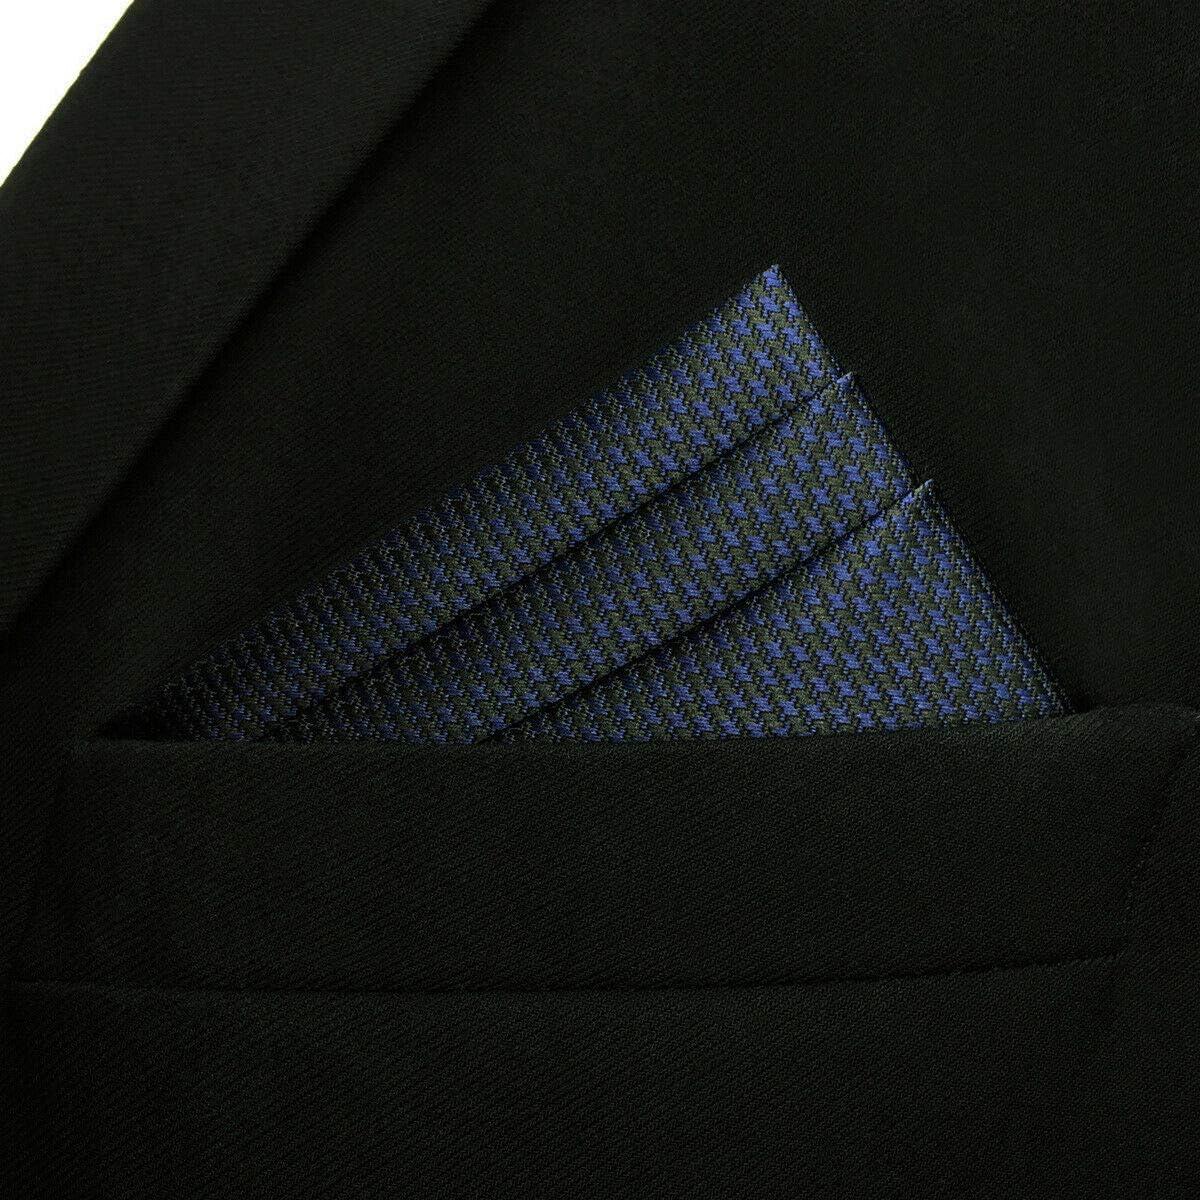 S/&W SHLAX/&WING Solid Blau Einsteckt/ücher Mens Gesch/äftsanzug Herren Seide